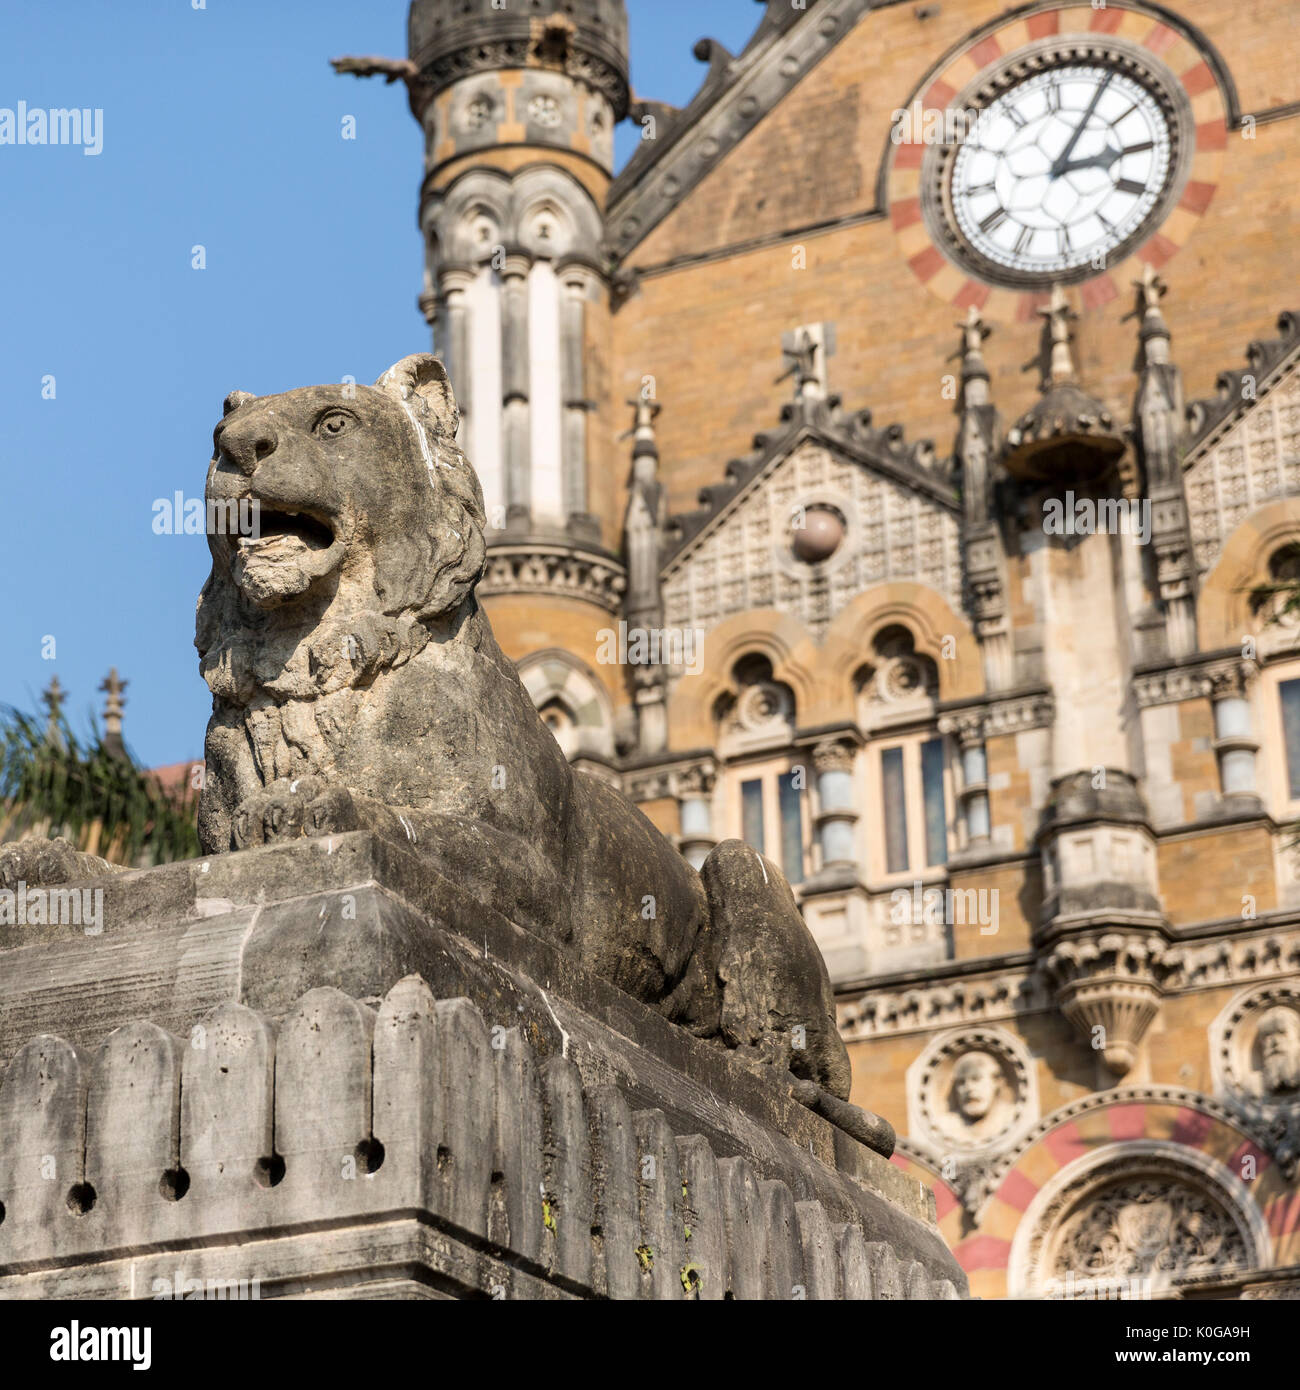 Clock Tower and Lion Statue at front of Chhatrapati Shivaji Terminus Railway Station, Mumbai - Stock Image